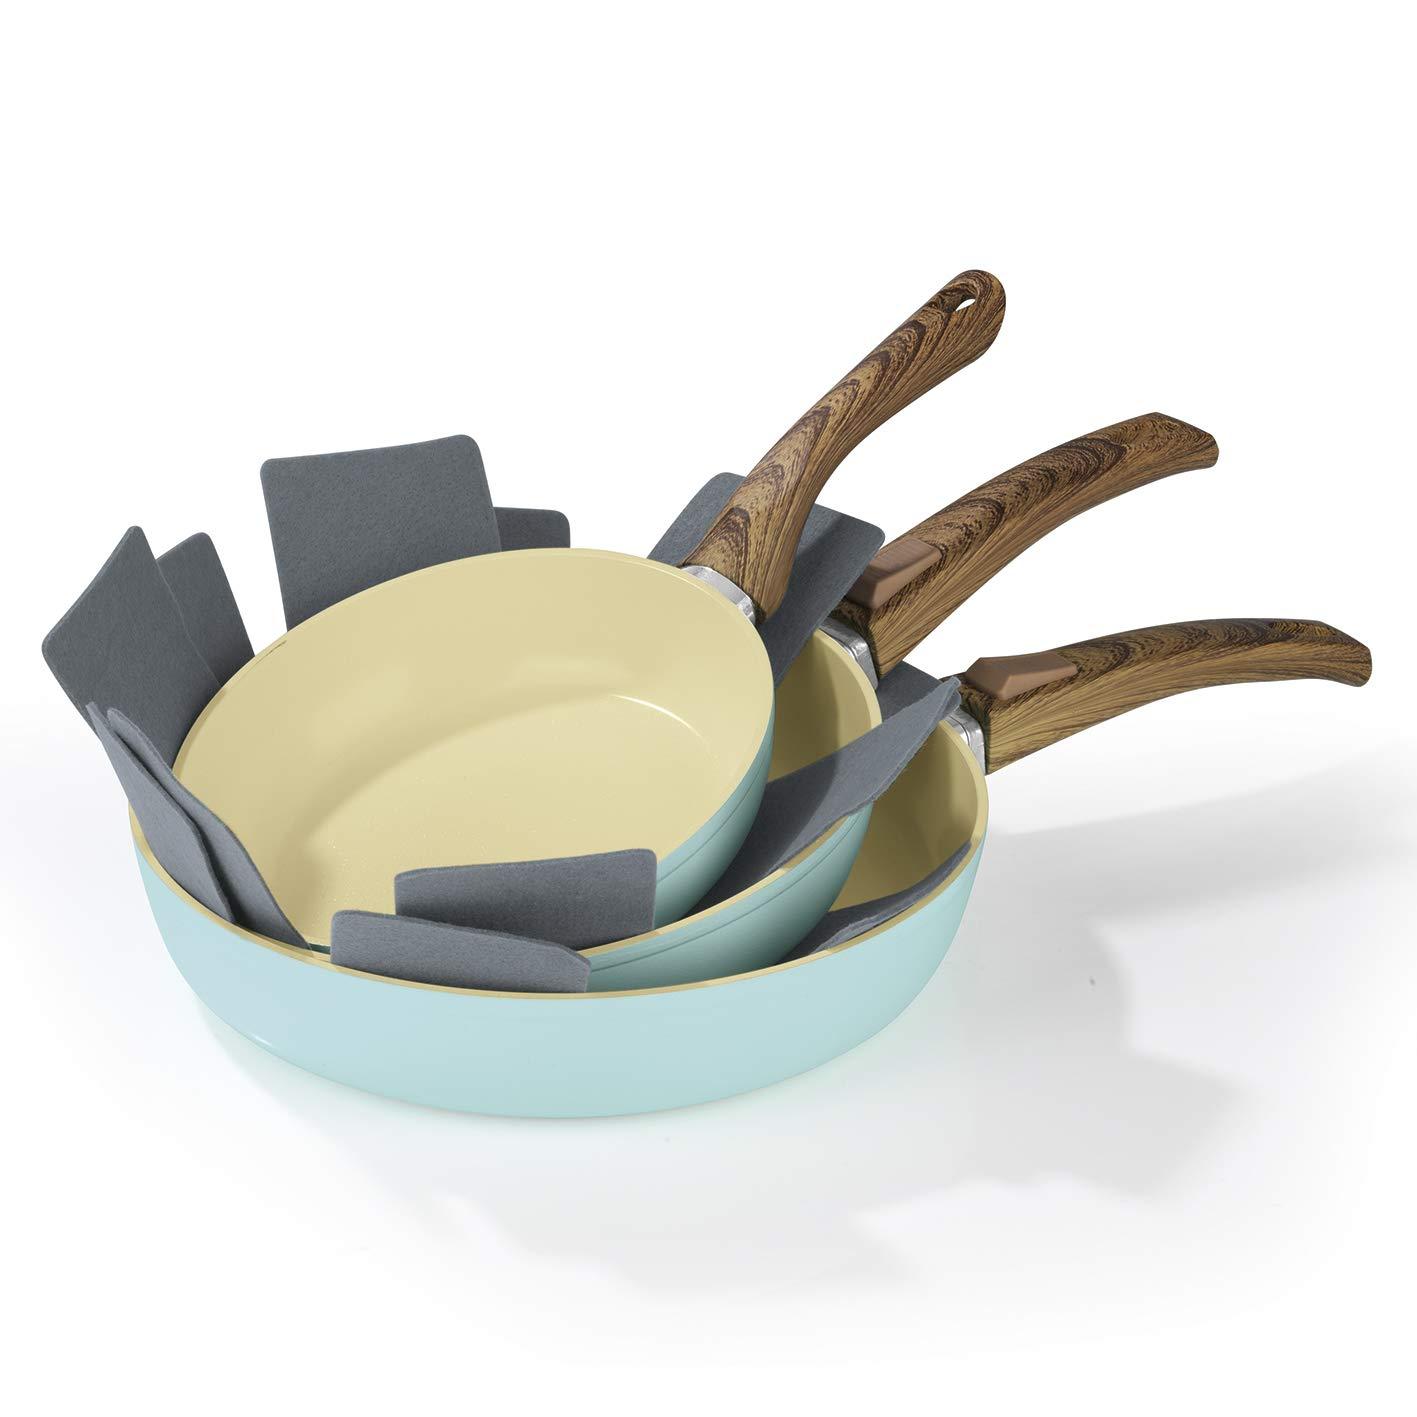 BRATmaxx Keramik Pfanne Set Induktion